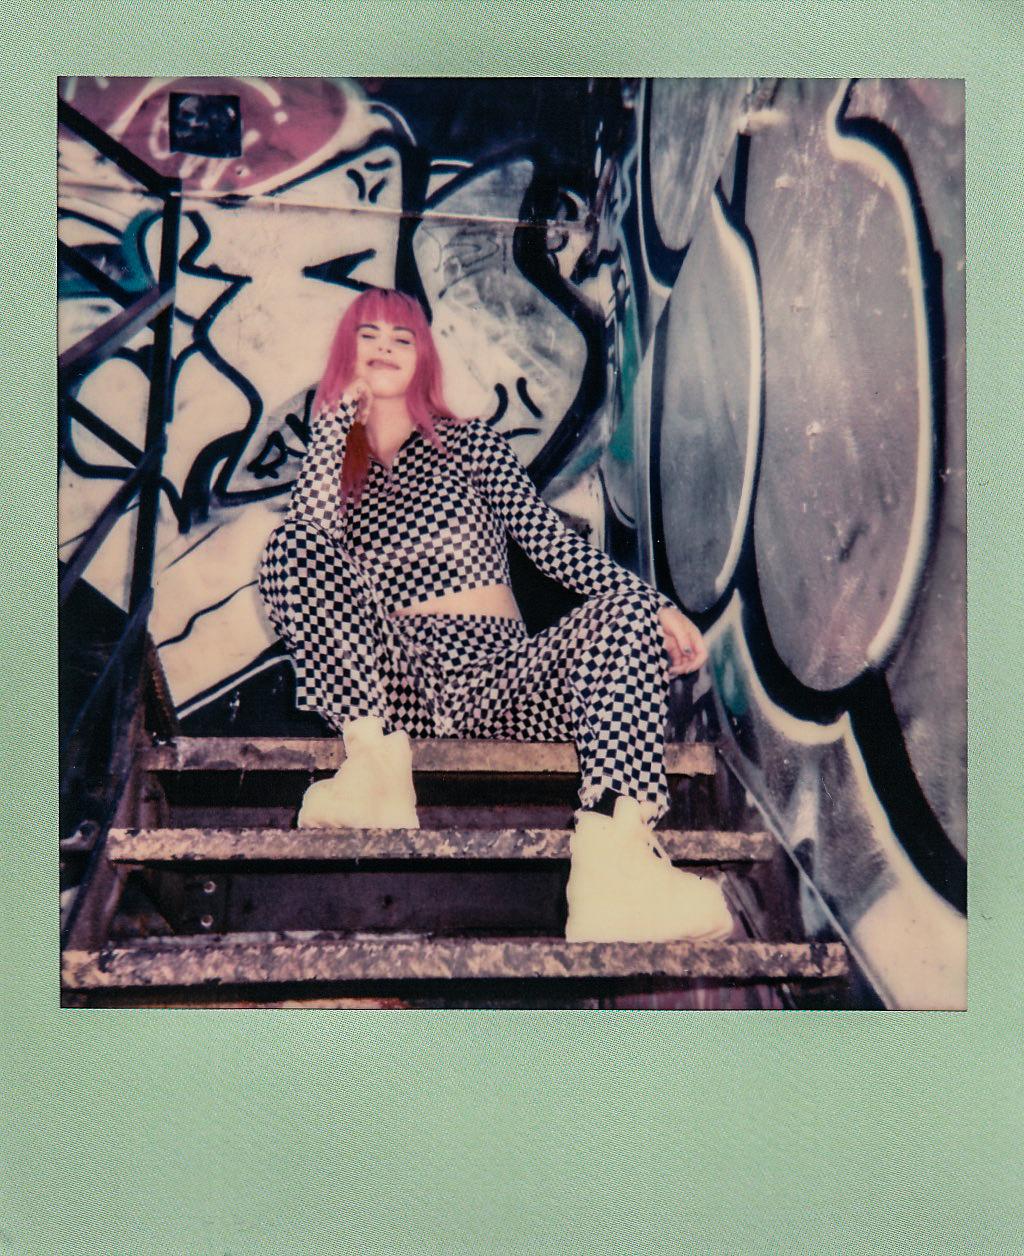 Girli Polaroid Finals - The Old Blue Last - 26.07.2018 -  Ant Adams-5.jpg